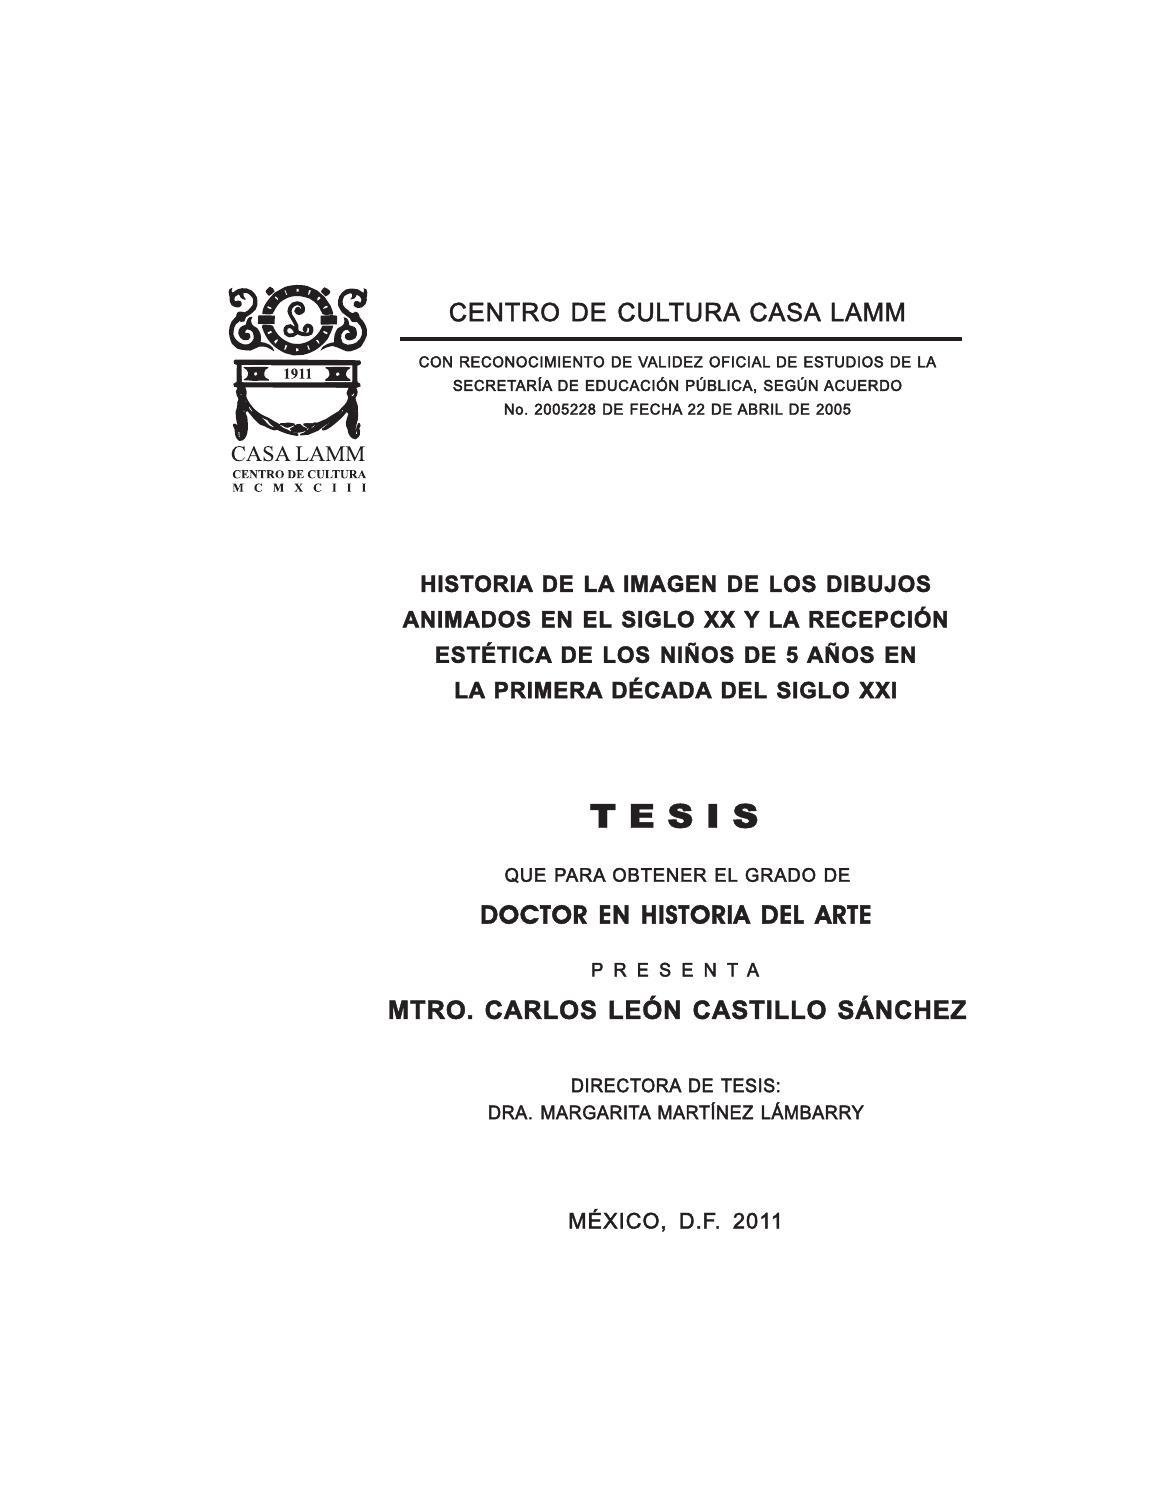 Castillo sanchez carlos leon by viviqt - issuu